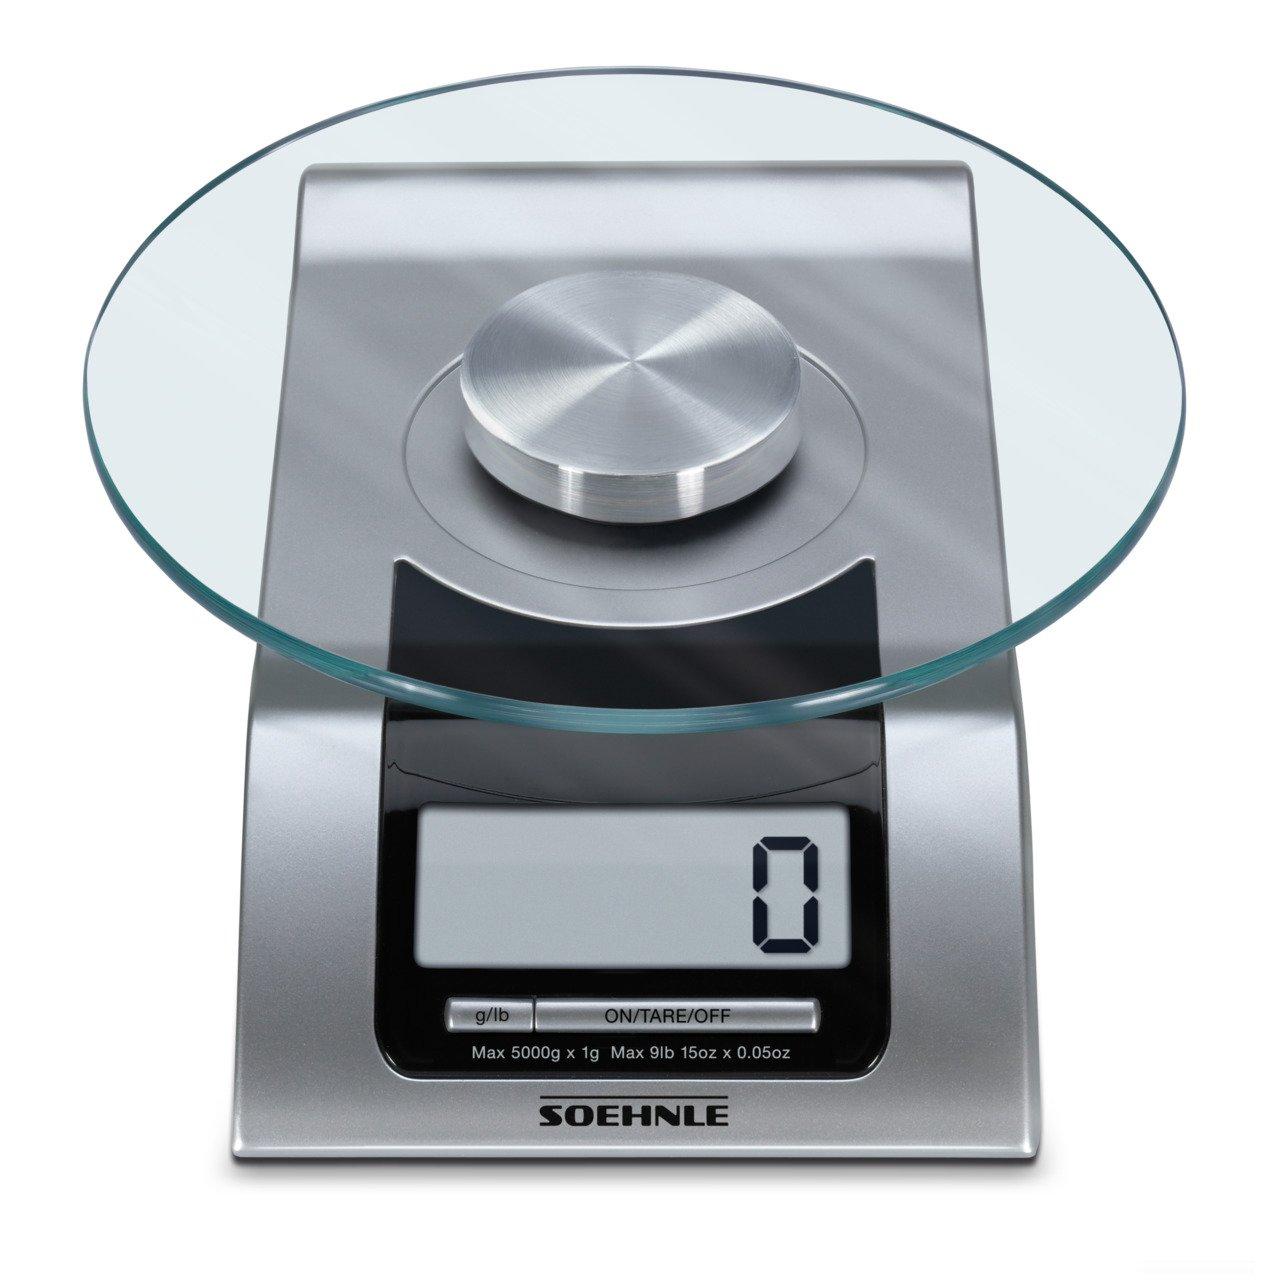 Amazon.com: Soehnle 65105, Style Digital Kitchen Scale, Silver ...